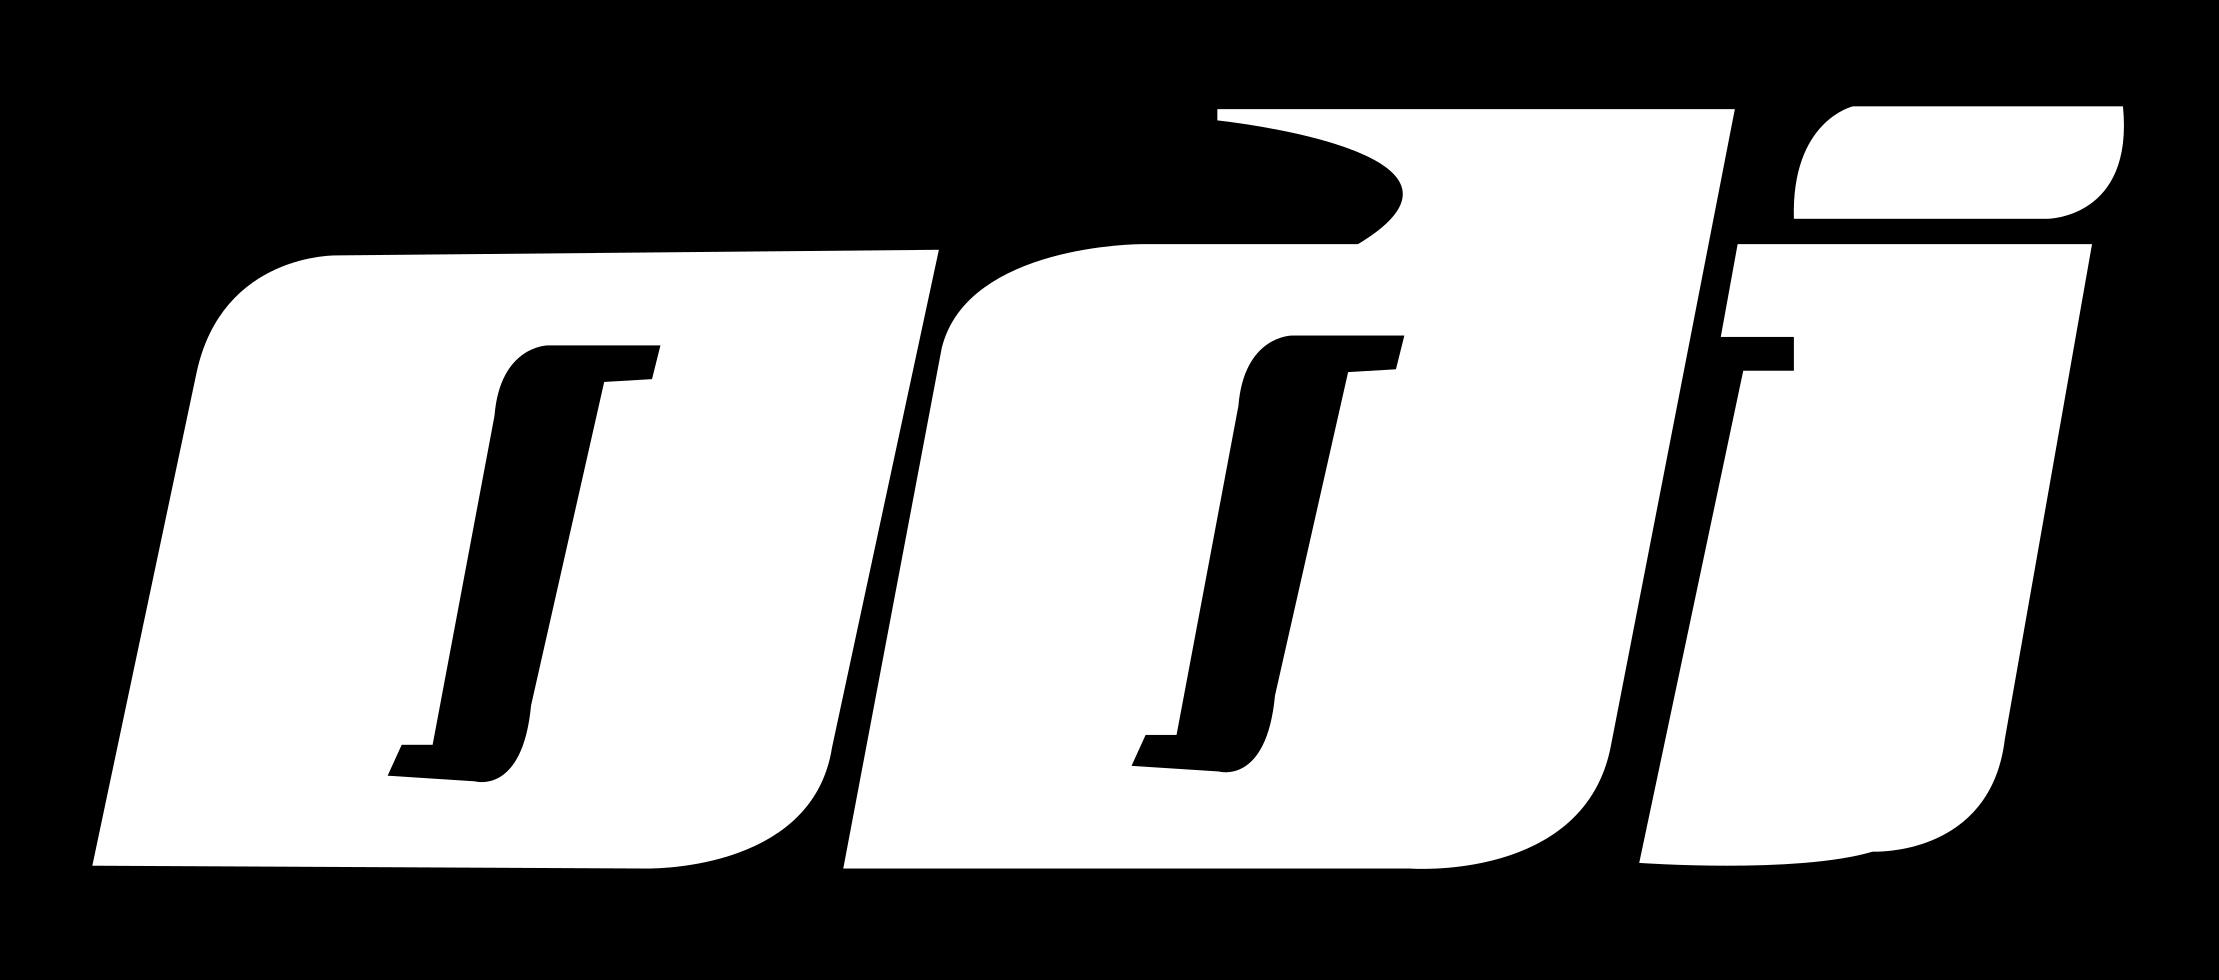 odi-grips-logo-png-transparent.png